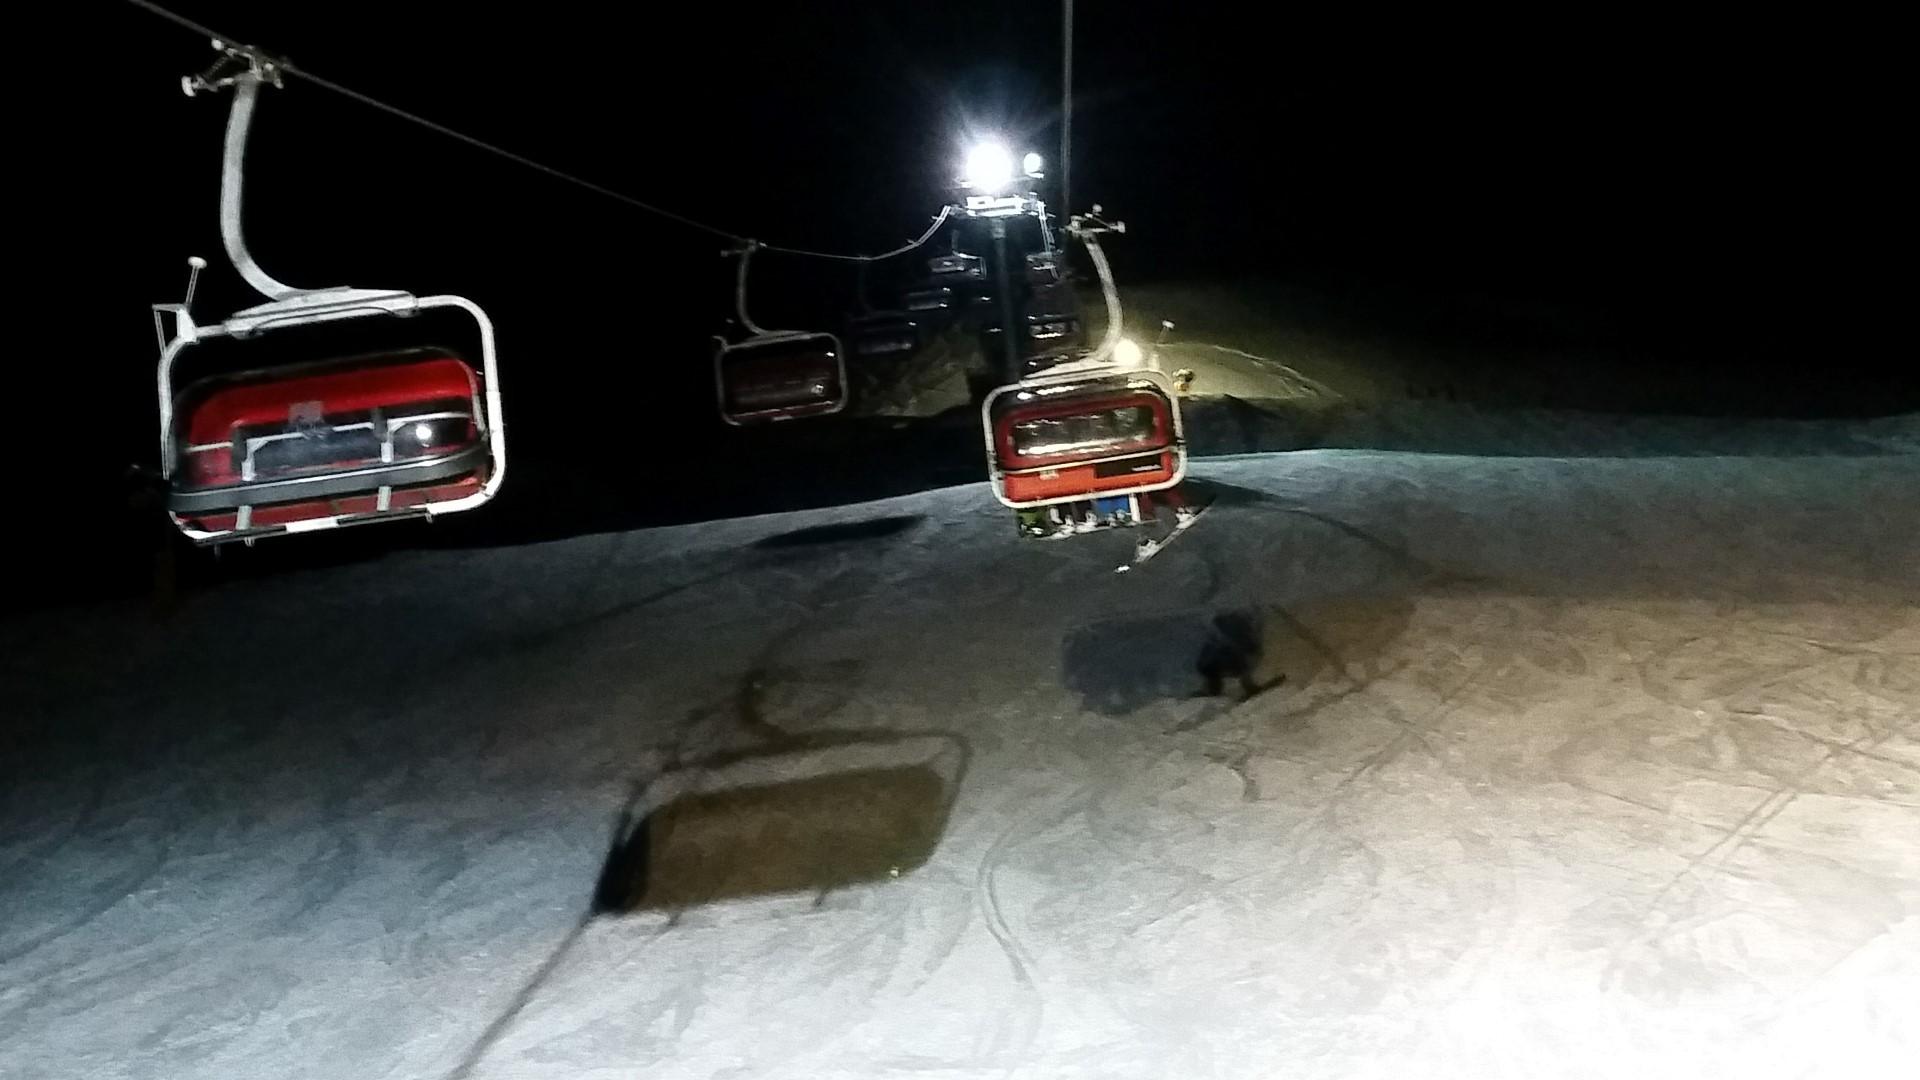 Snownights Lenzerheide – Aprés Ski und Nachtskifahren on top of the mountain